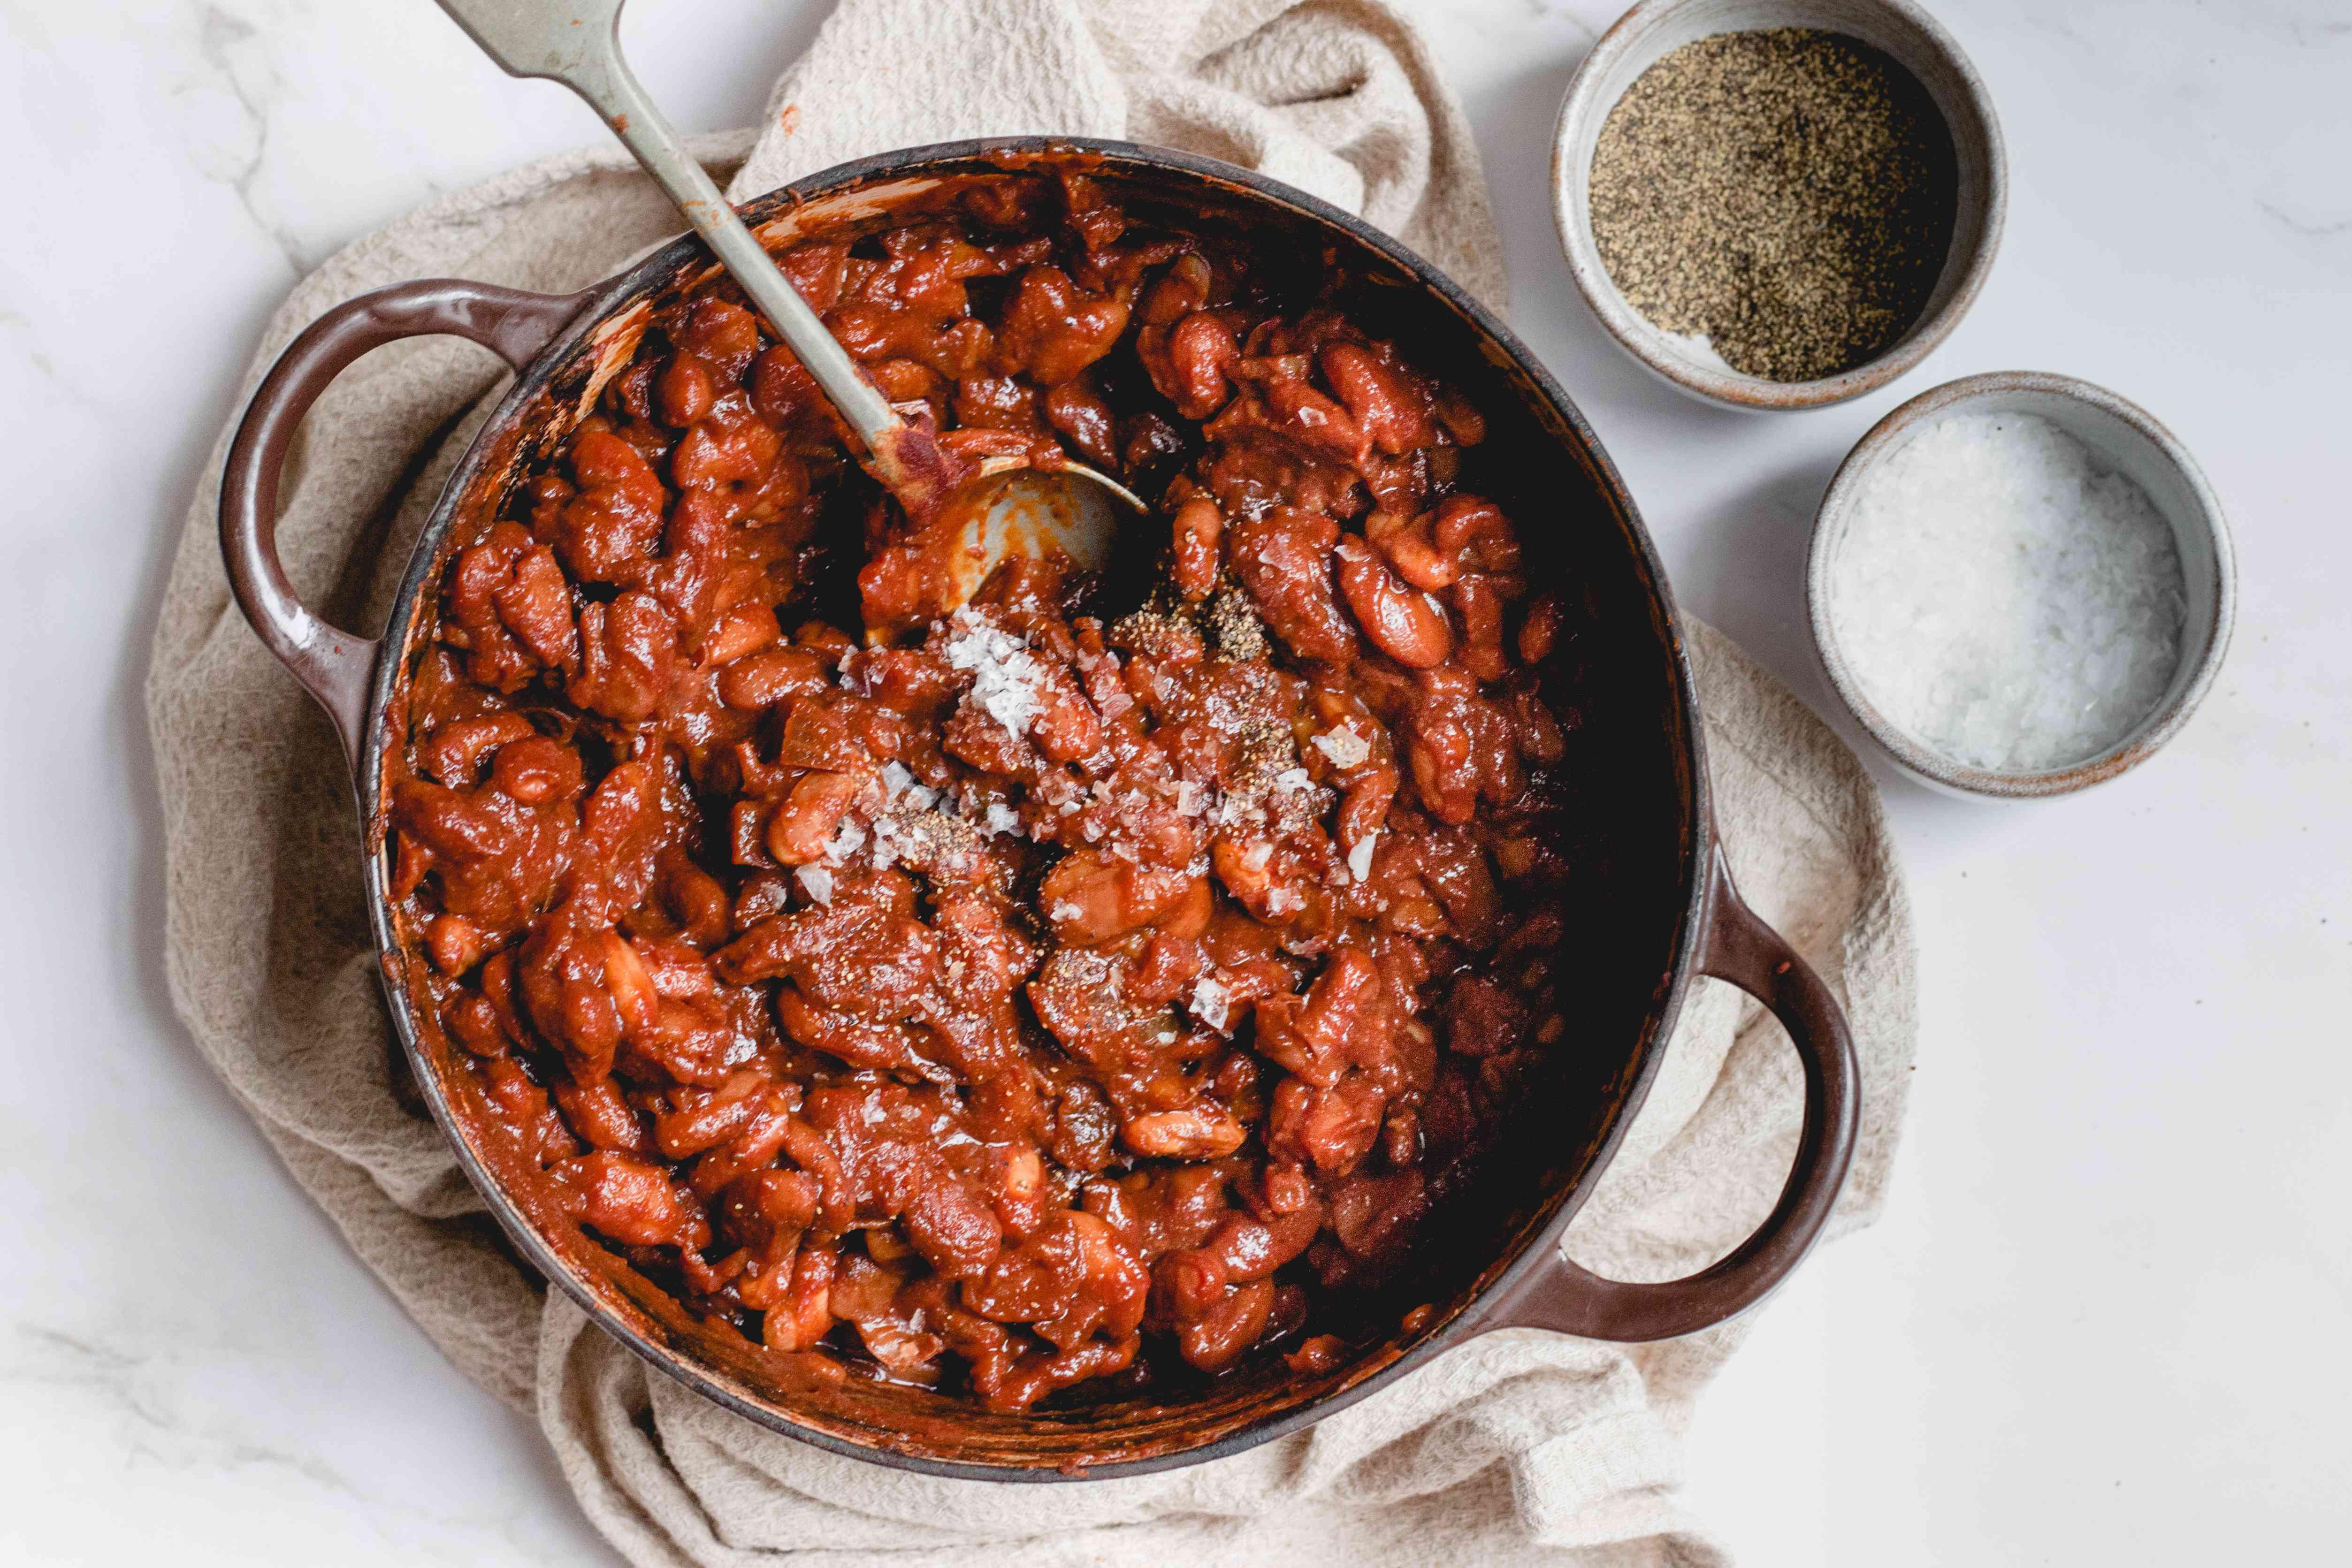 Vegetarian Boston Baked Beans With Molasses, salt and pepper added